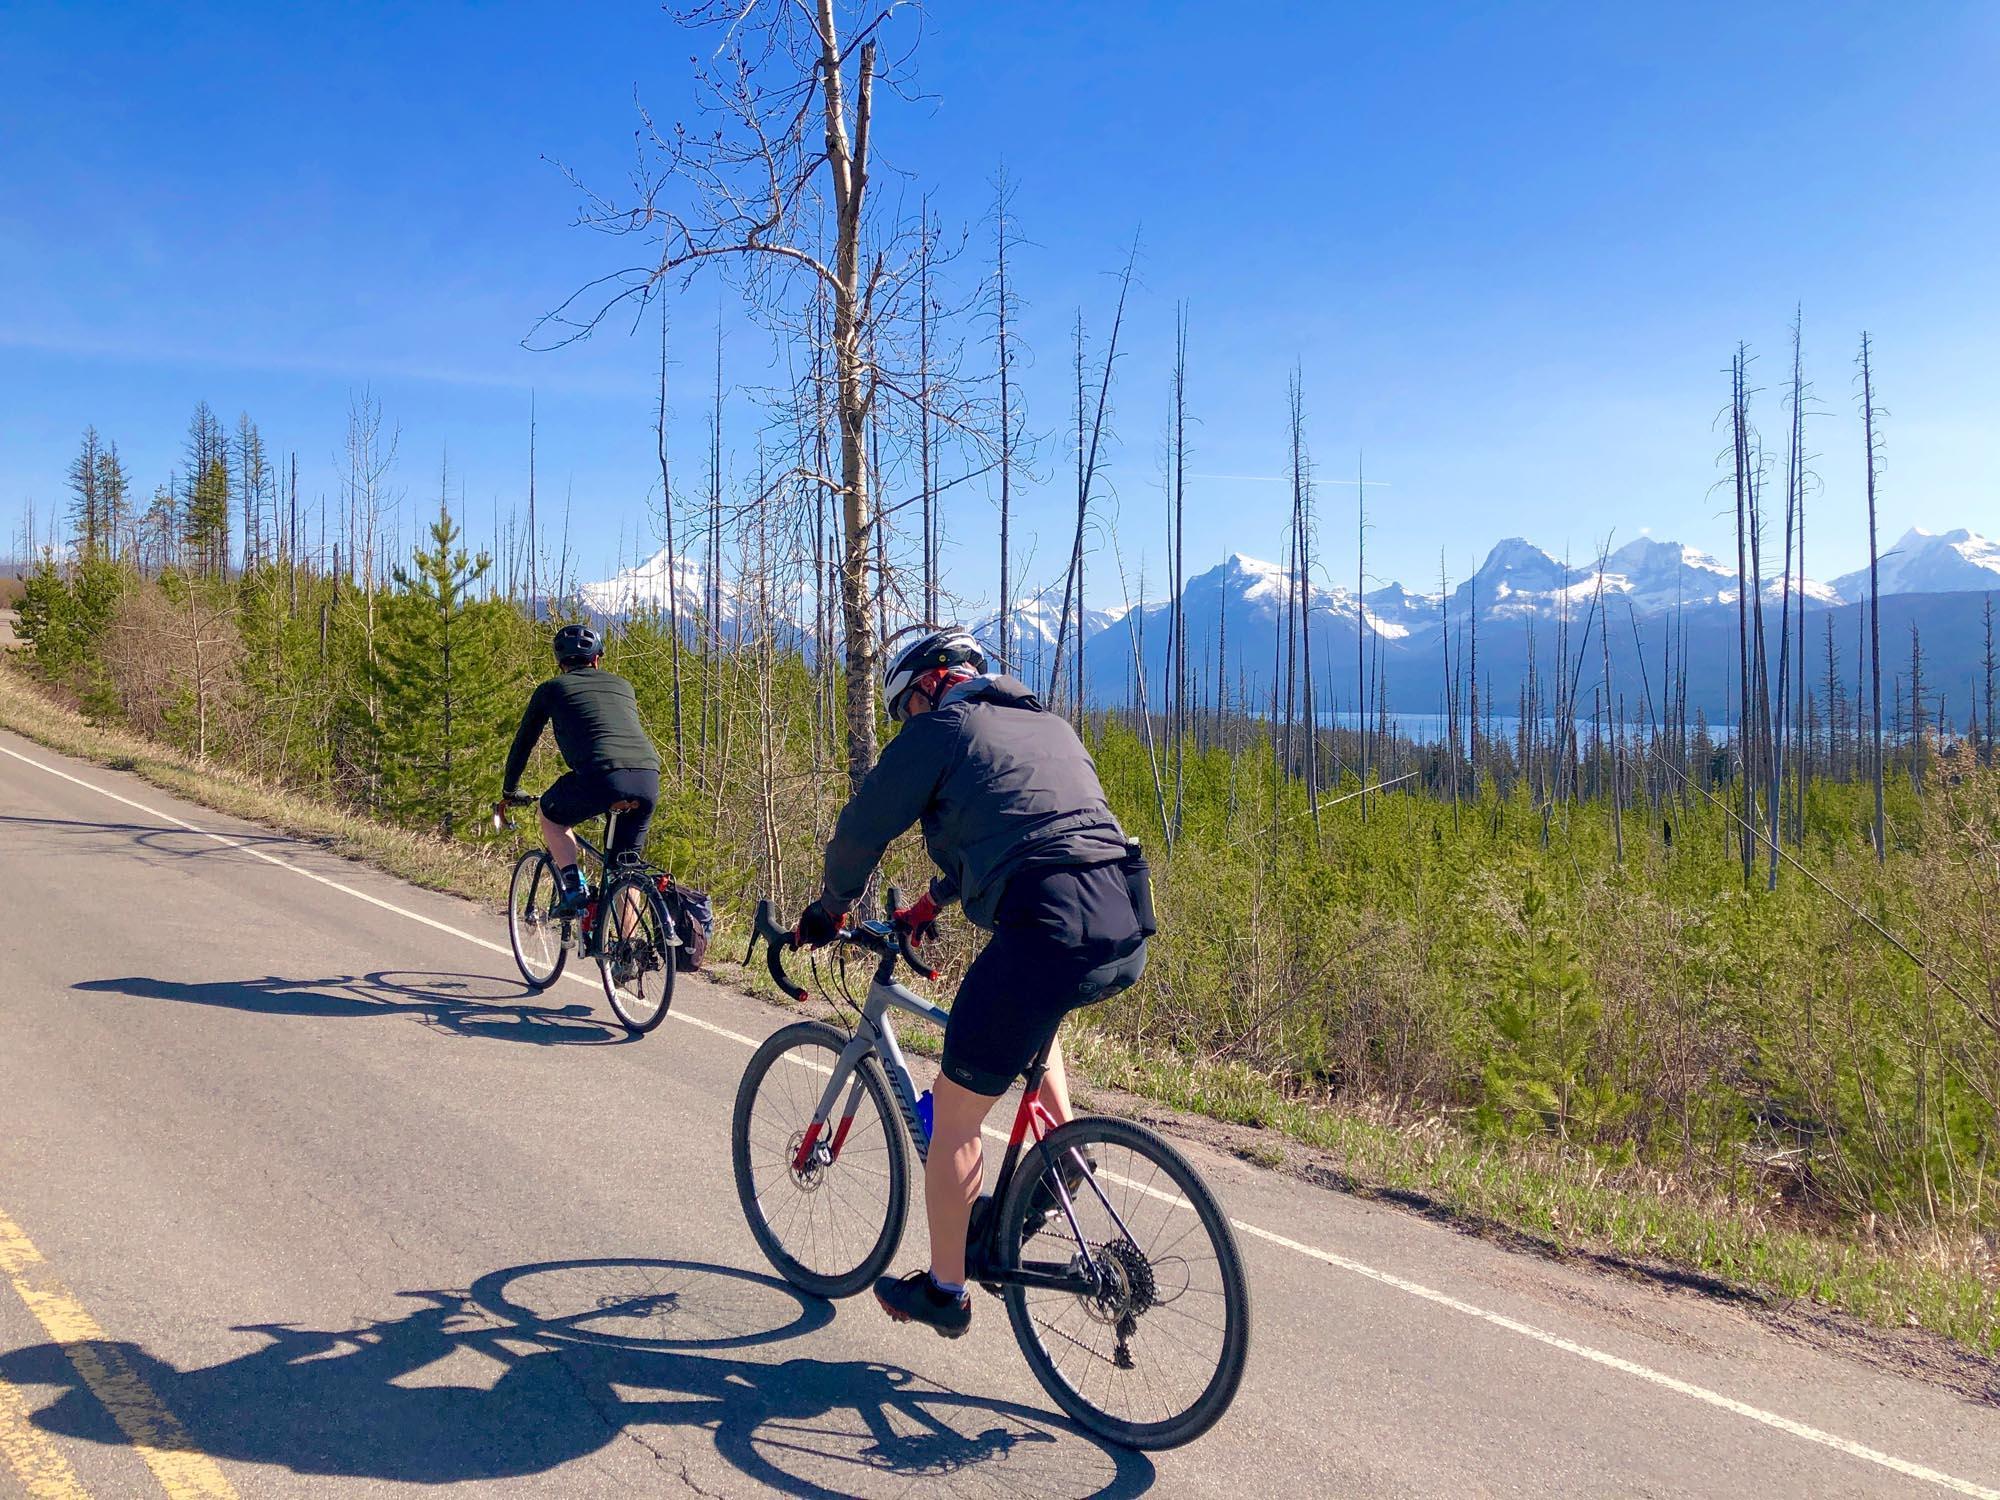 Cyclists ride along the Camas Road in Glacier National Park. Photo: Brian Schott